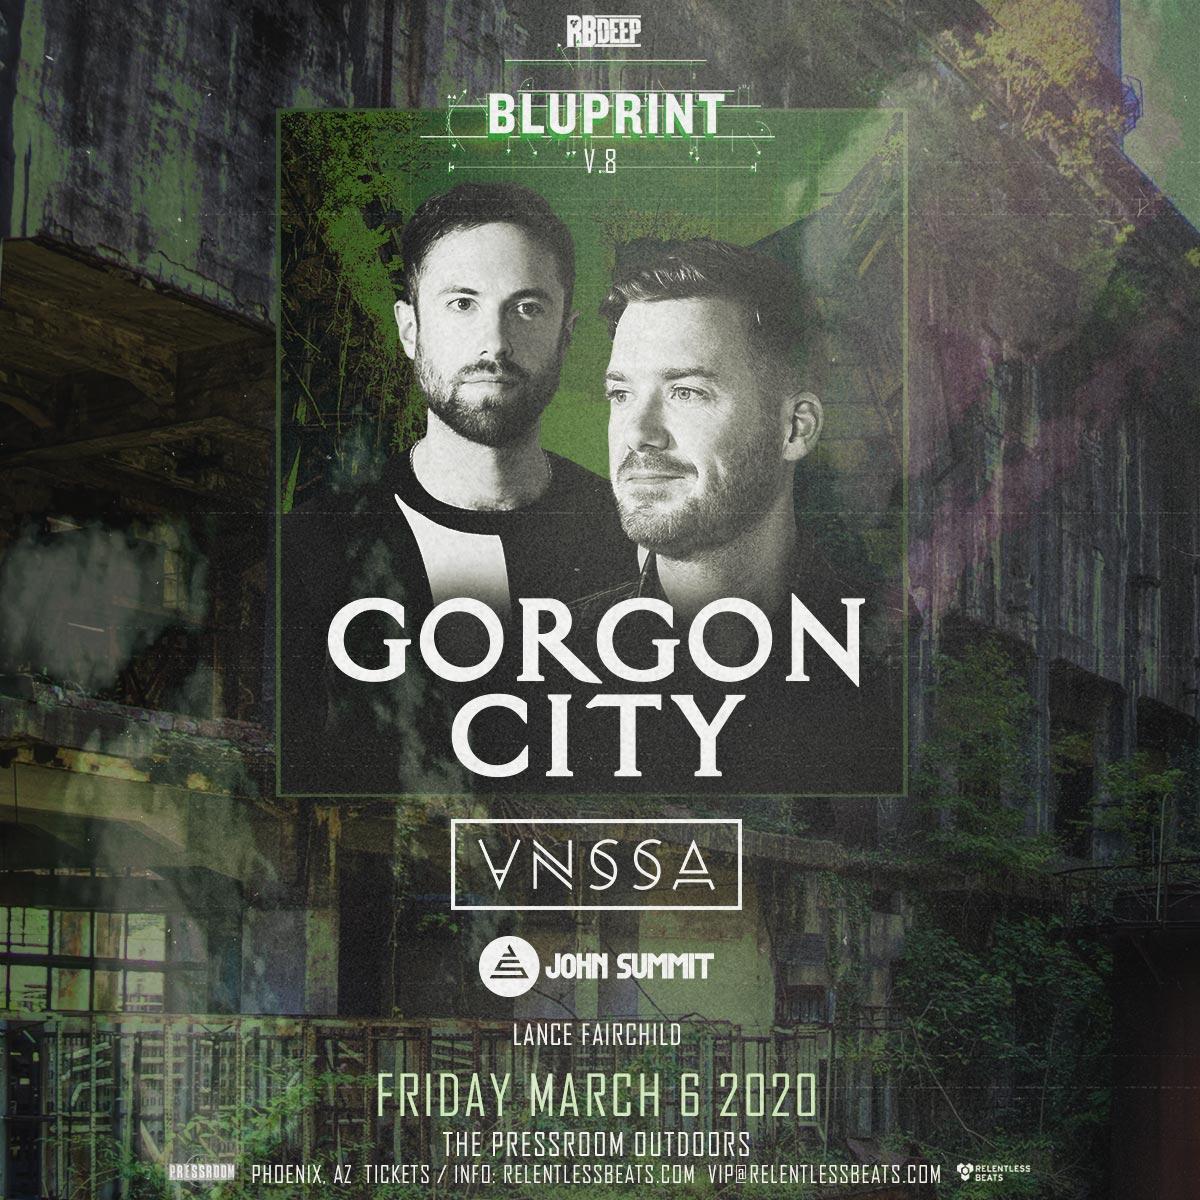 Flyer for Gorgon City, VNSSA, & John Summit @ Bluprint v.8